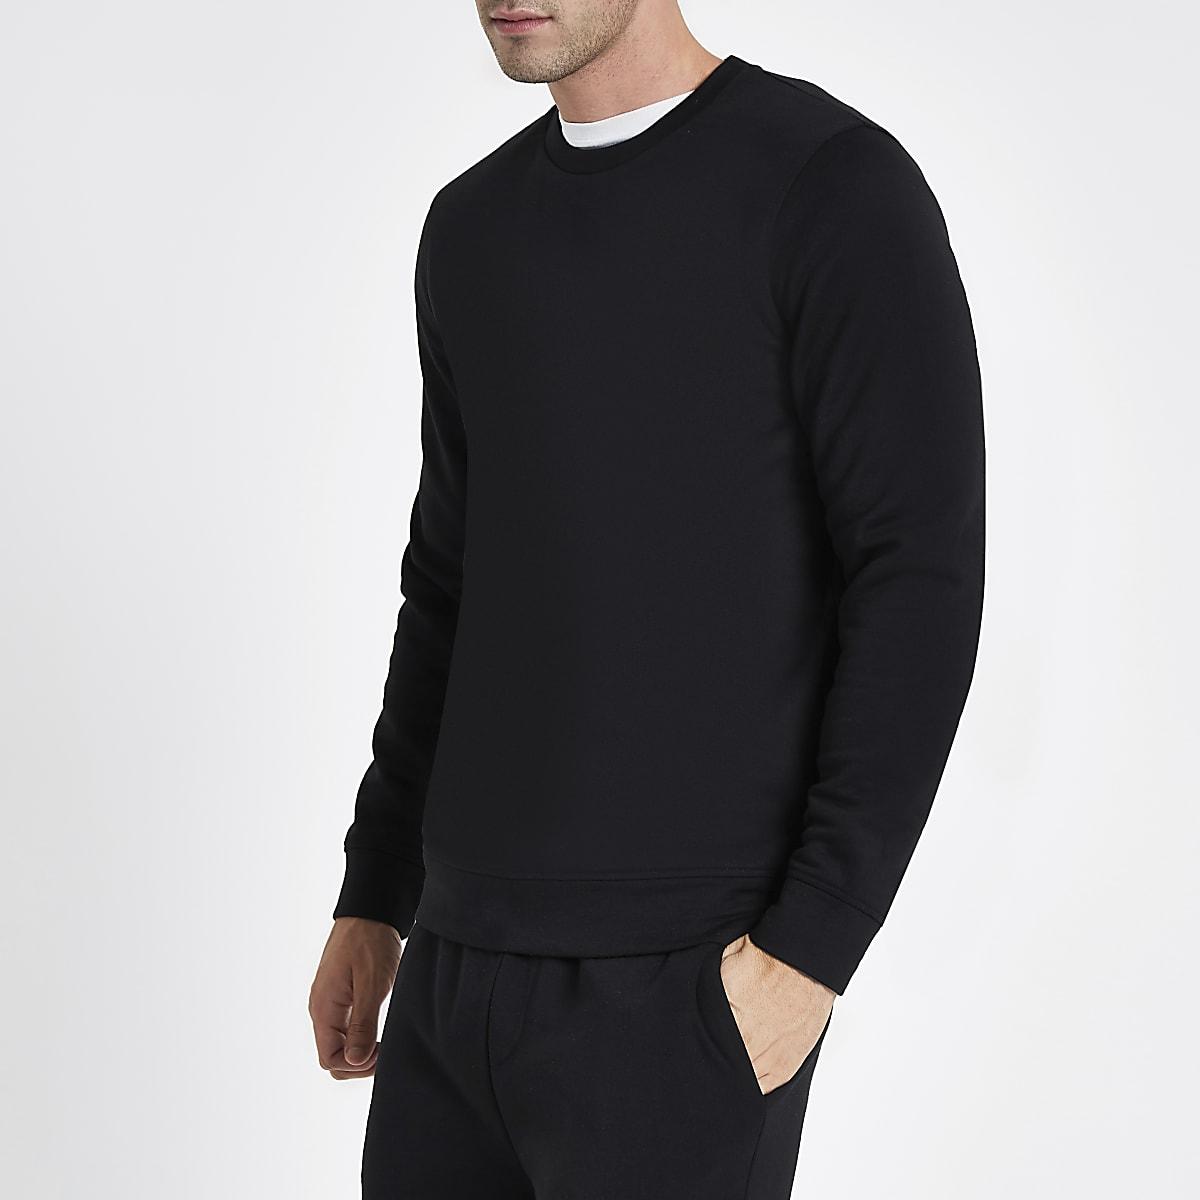 Black Crew Neck Long Sleeve Sweatshirt - Sweatshirts - Hoodies -8783